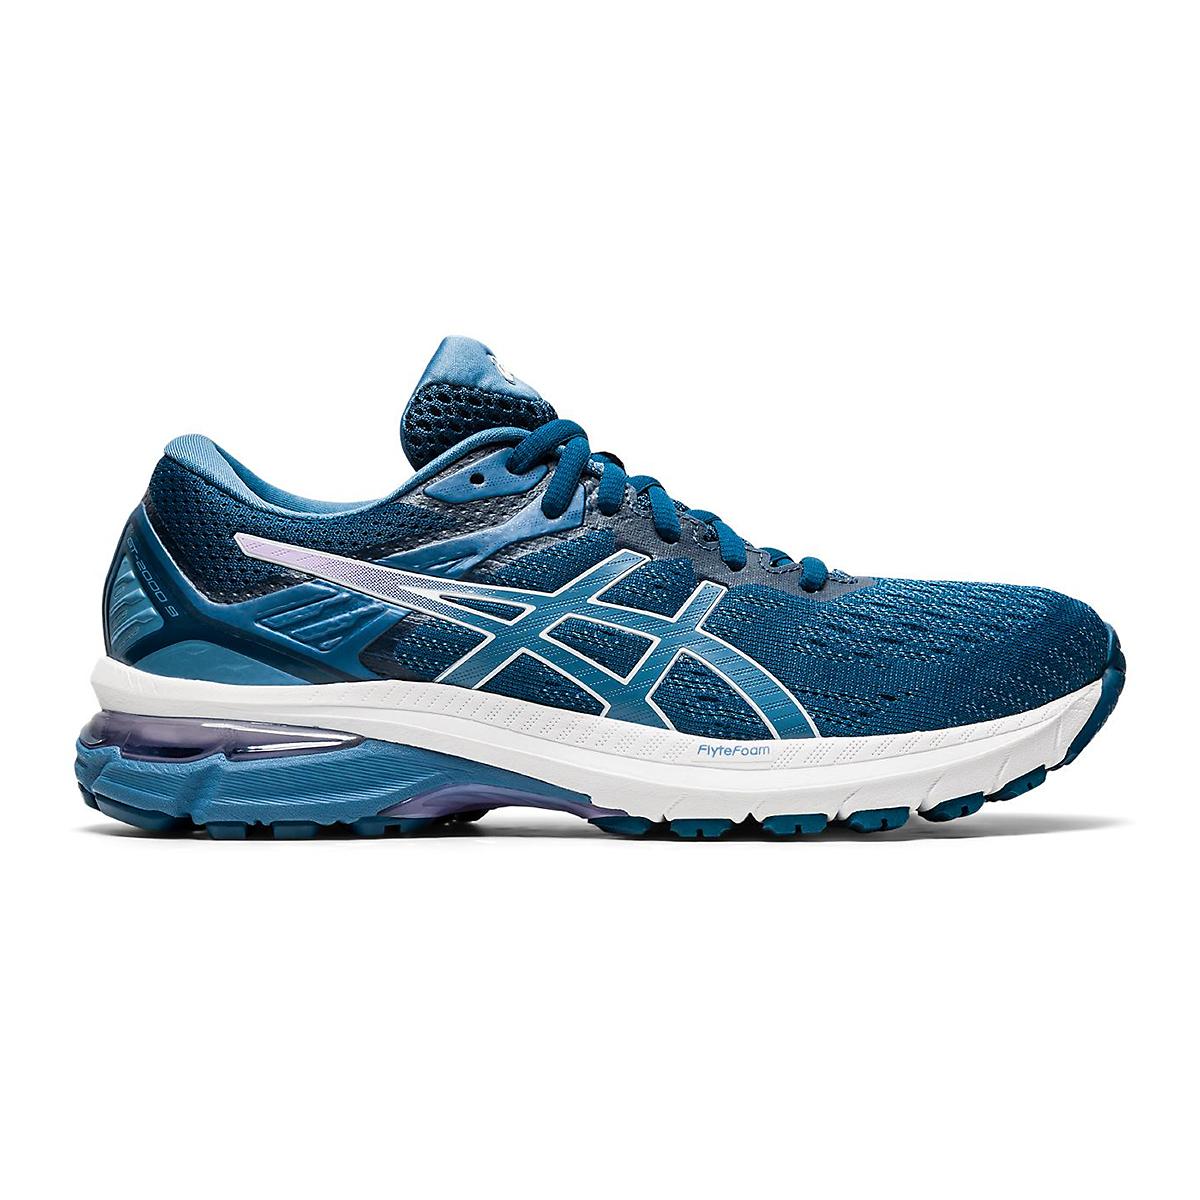 Women's Asics Gt-2000 9 Running Shoe - Color: Mako Blue/Grey - Size: 6 - Width: Wide, Mako Blue/Grey, large, image 1